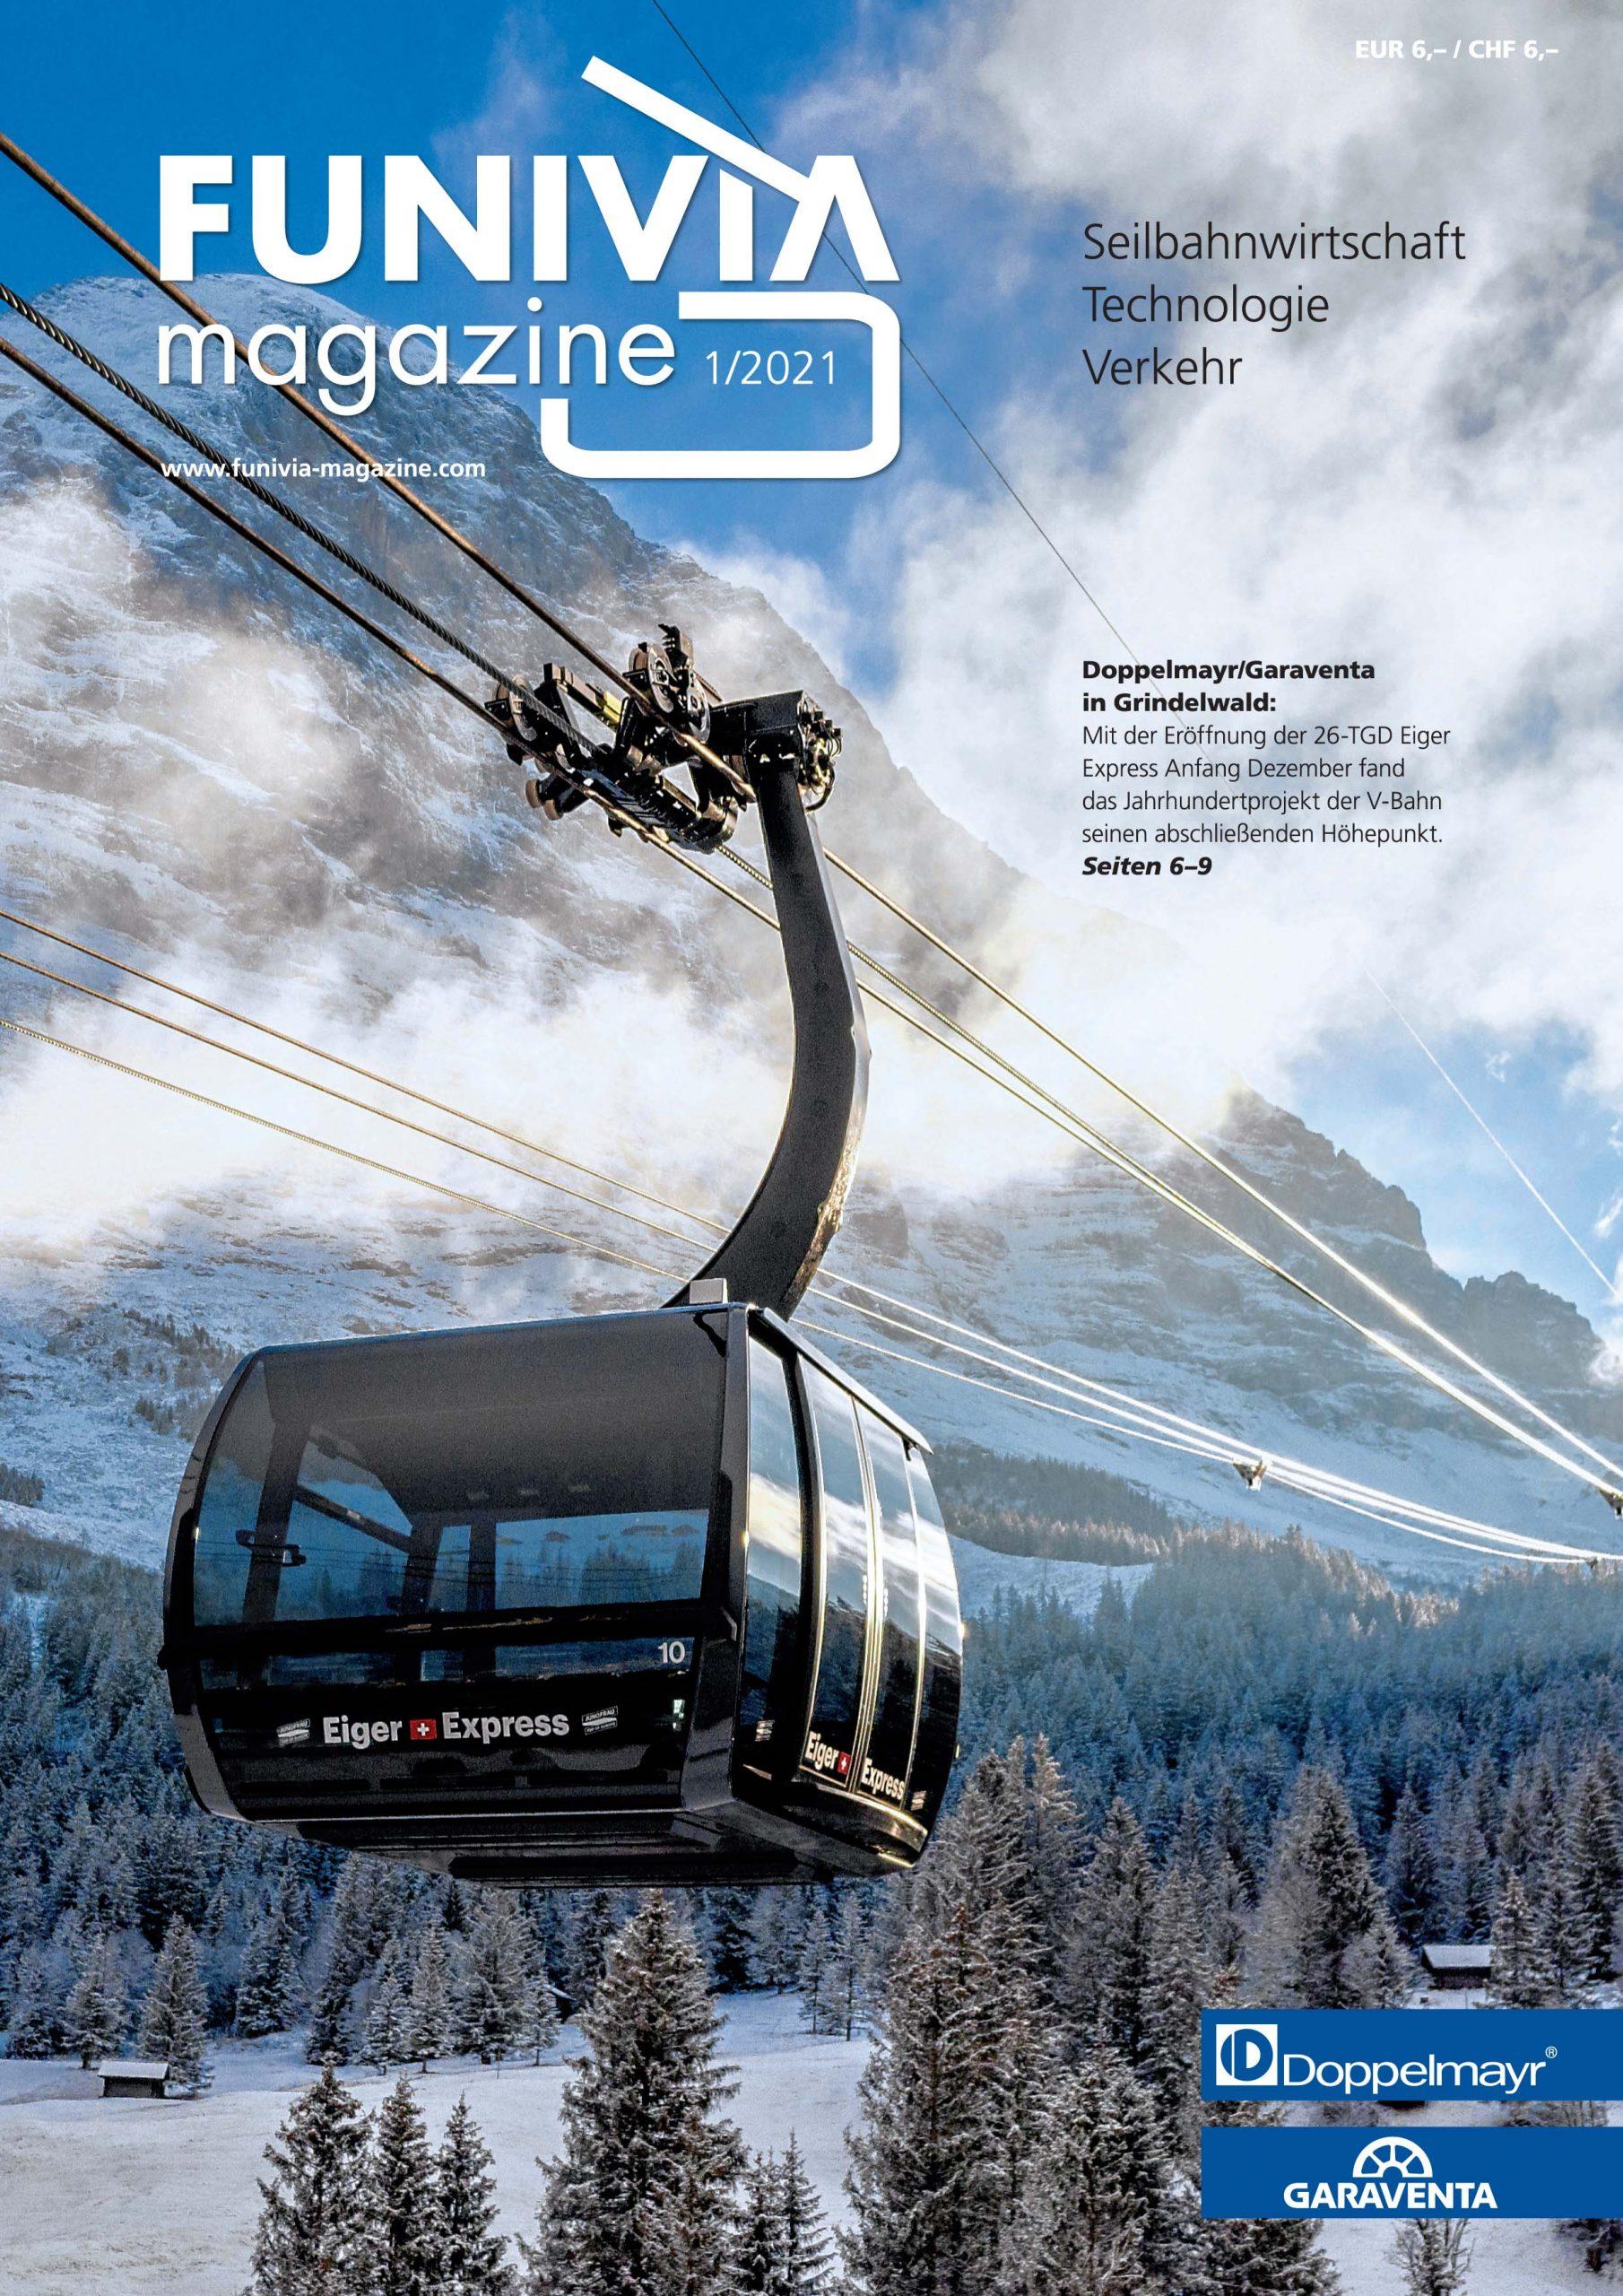 https://www.funivia-magazine.com/wp-content/uploads/2021/02/Funivia_01_2021_low.pdf